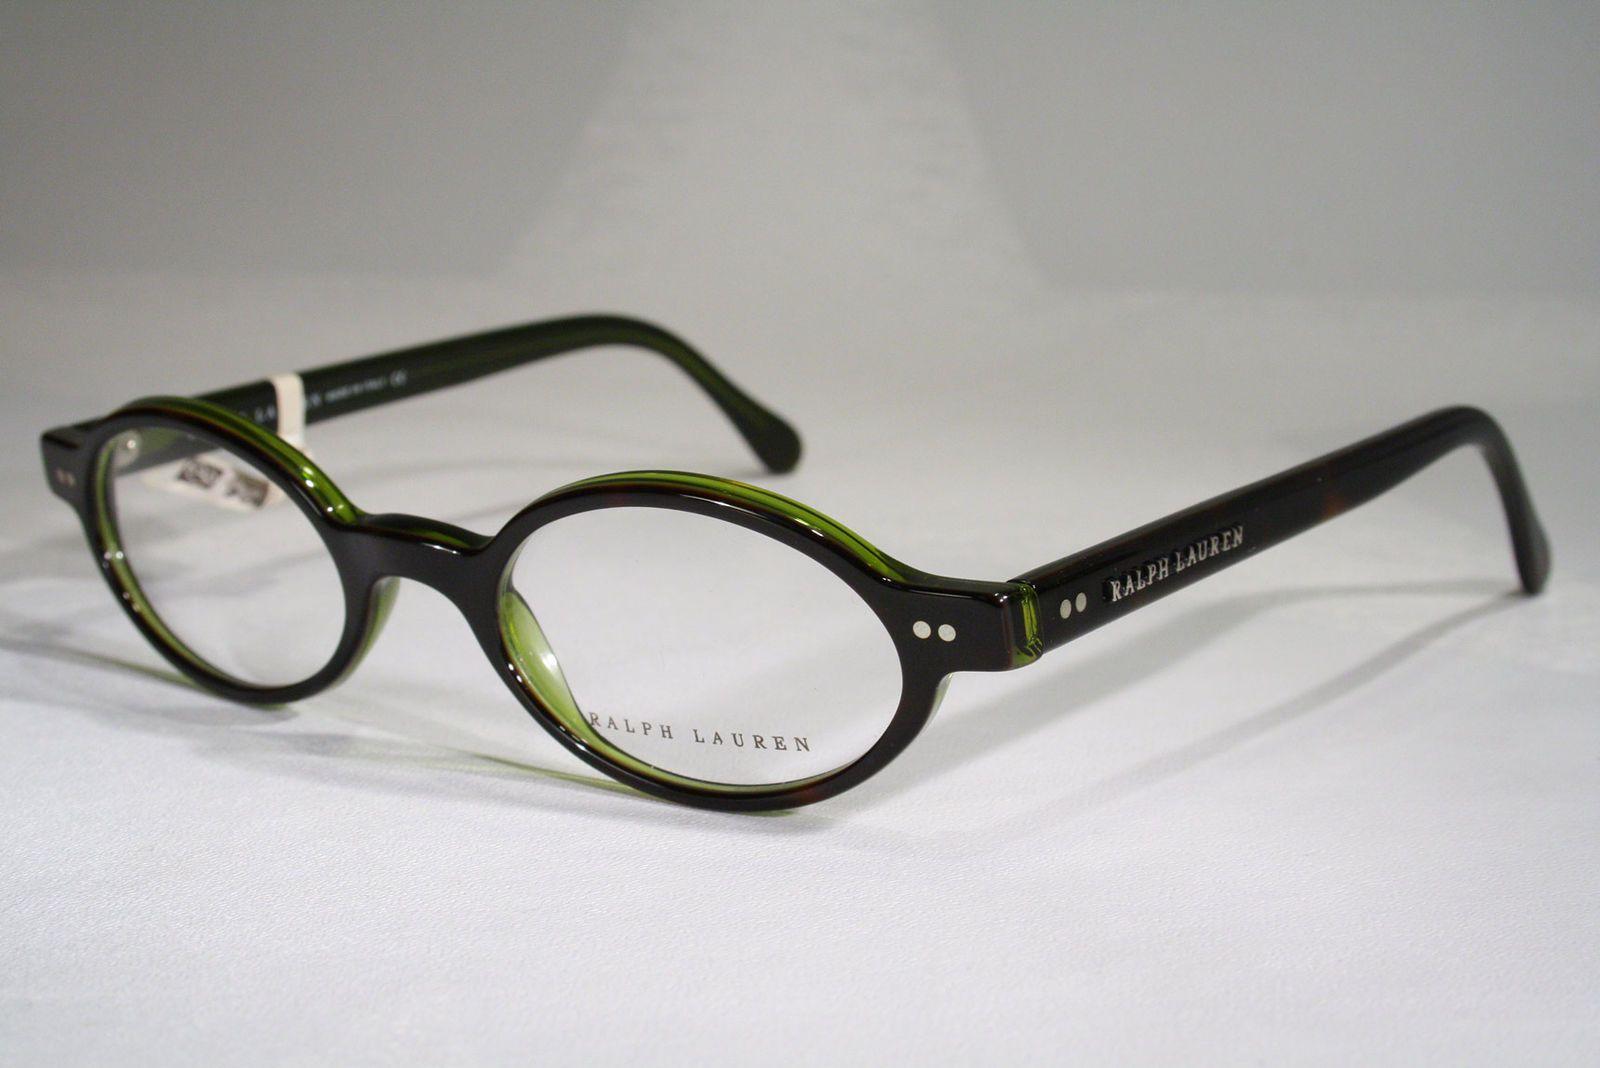 c72e249c26e3 Women s POLO RALPH LAUREN 6046 Translucent Tortoise   Green Arty  Individualistic Oval Eyeglass Frames   eBay (RipVanW)